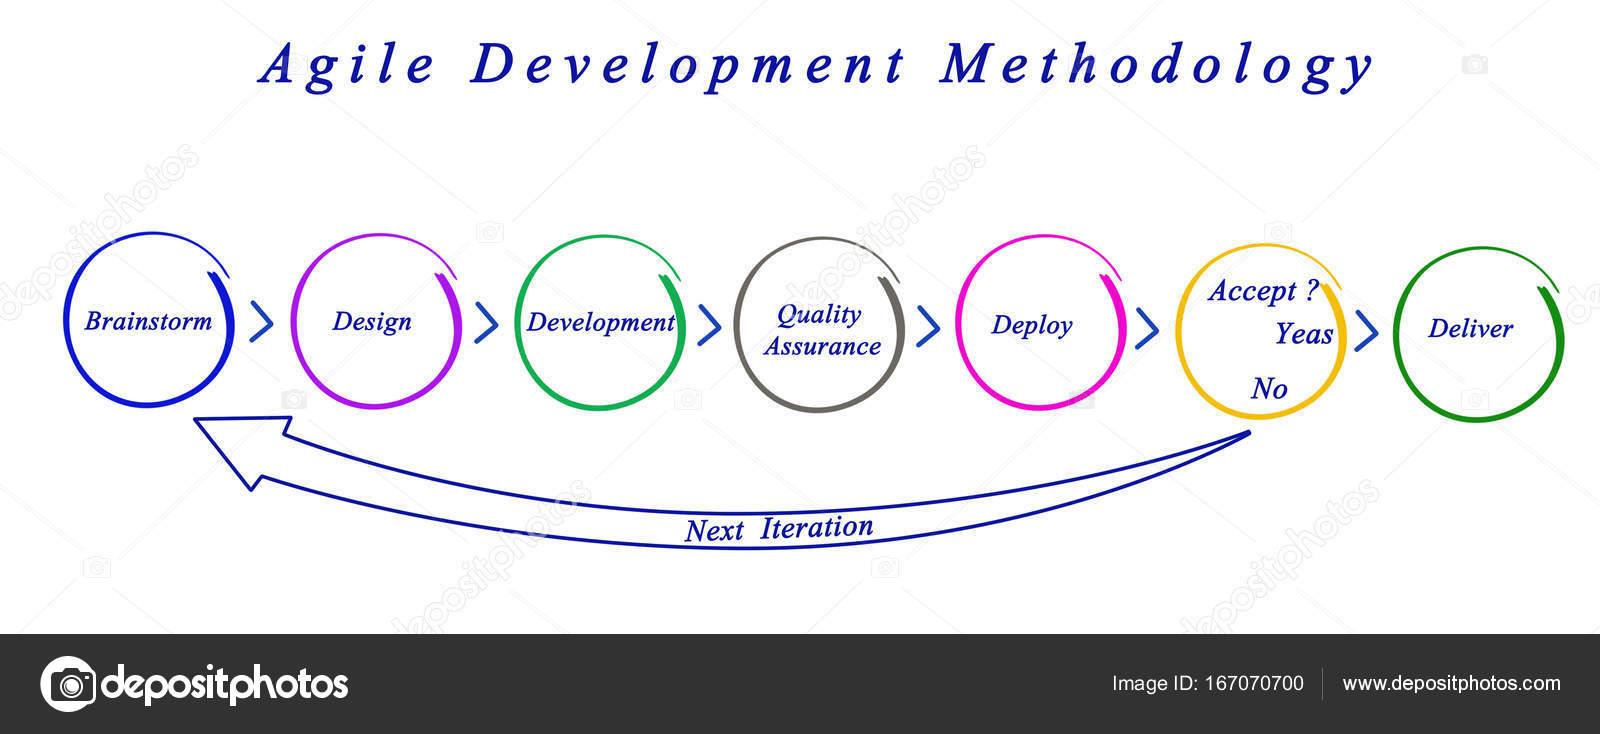 Diagrama da metodologia gil de desenvolvimento stock photo diagrama da metodologia gil de desenvolvimento foto de vaeenma ccuart Gallery